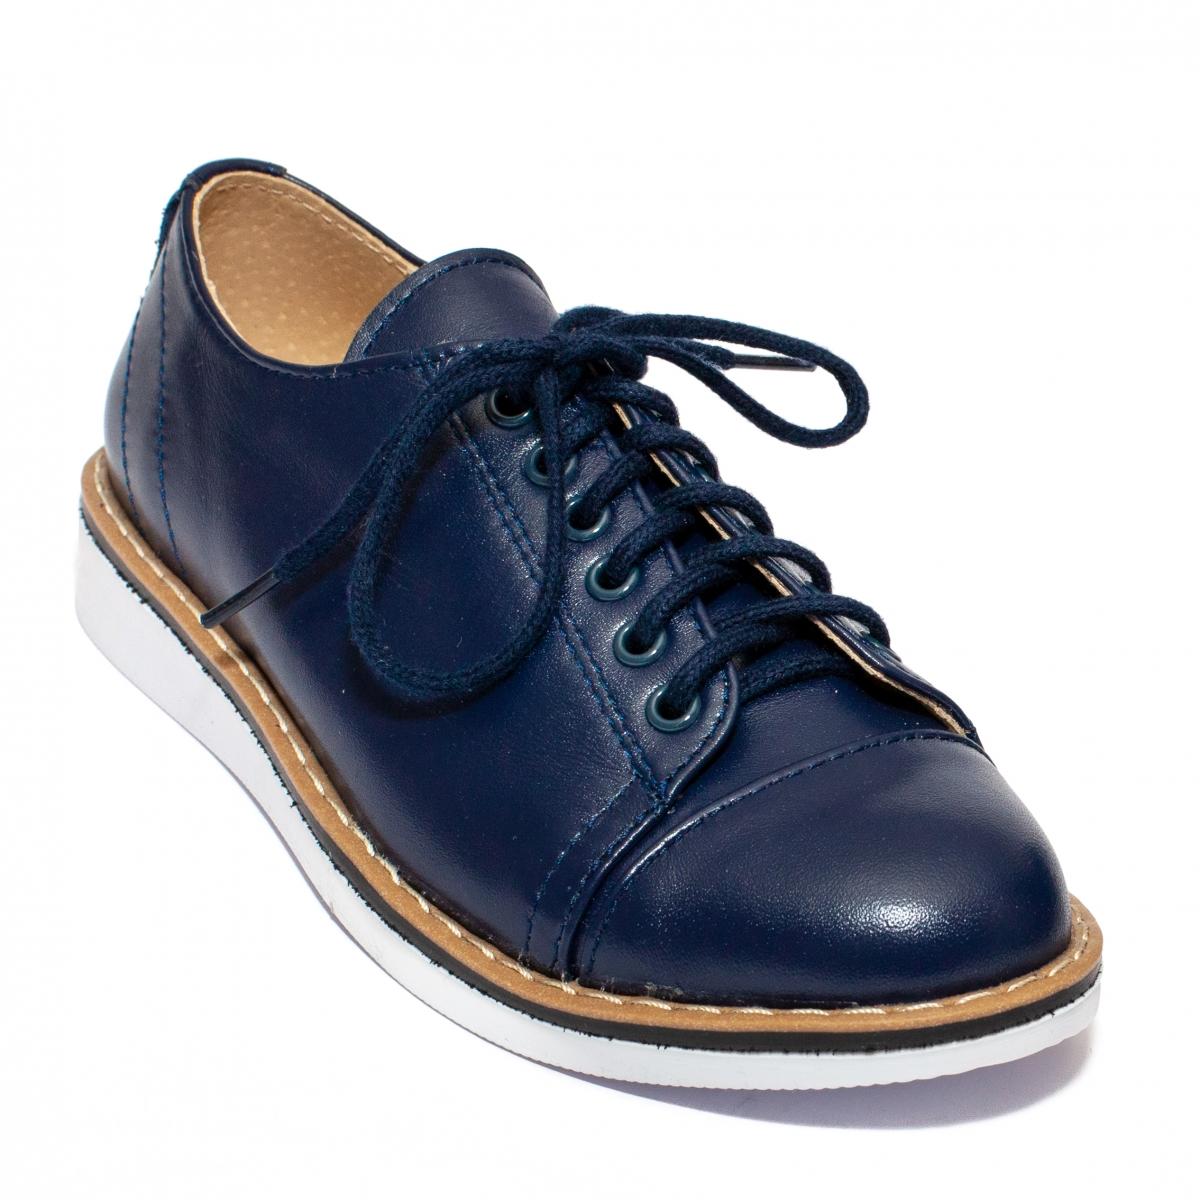 Pantofi copii piele 1384 blumarin box 26-36